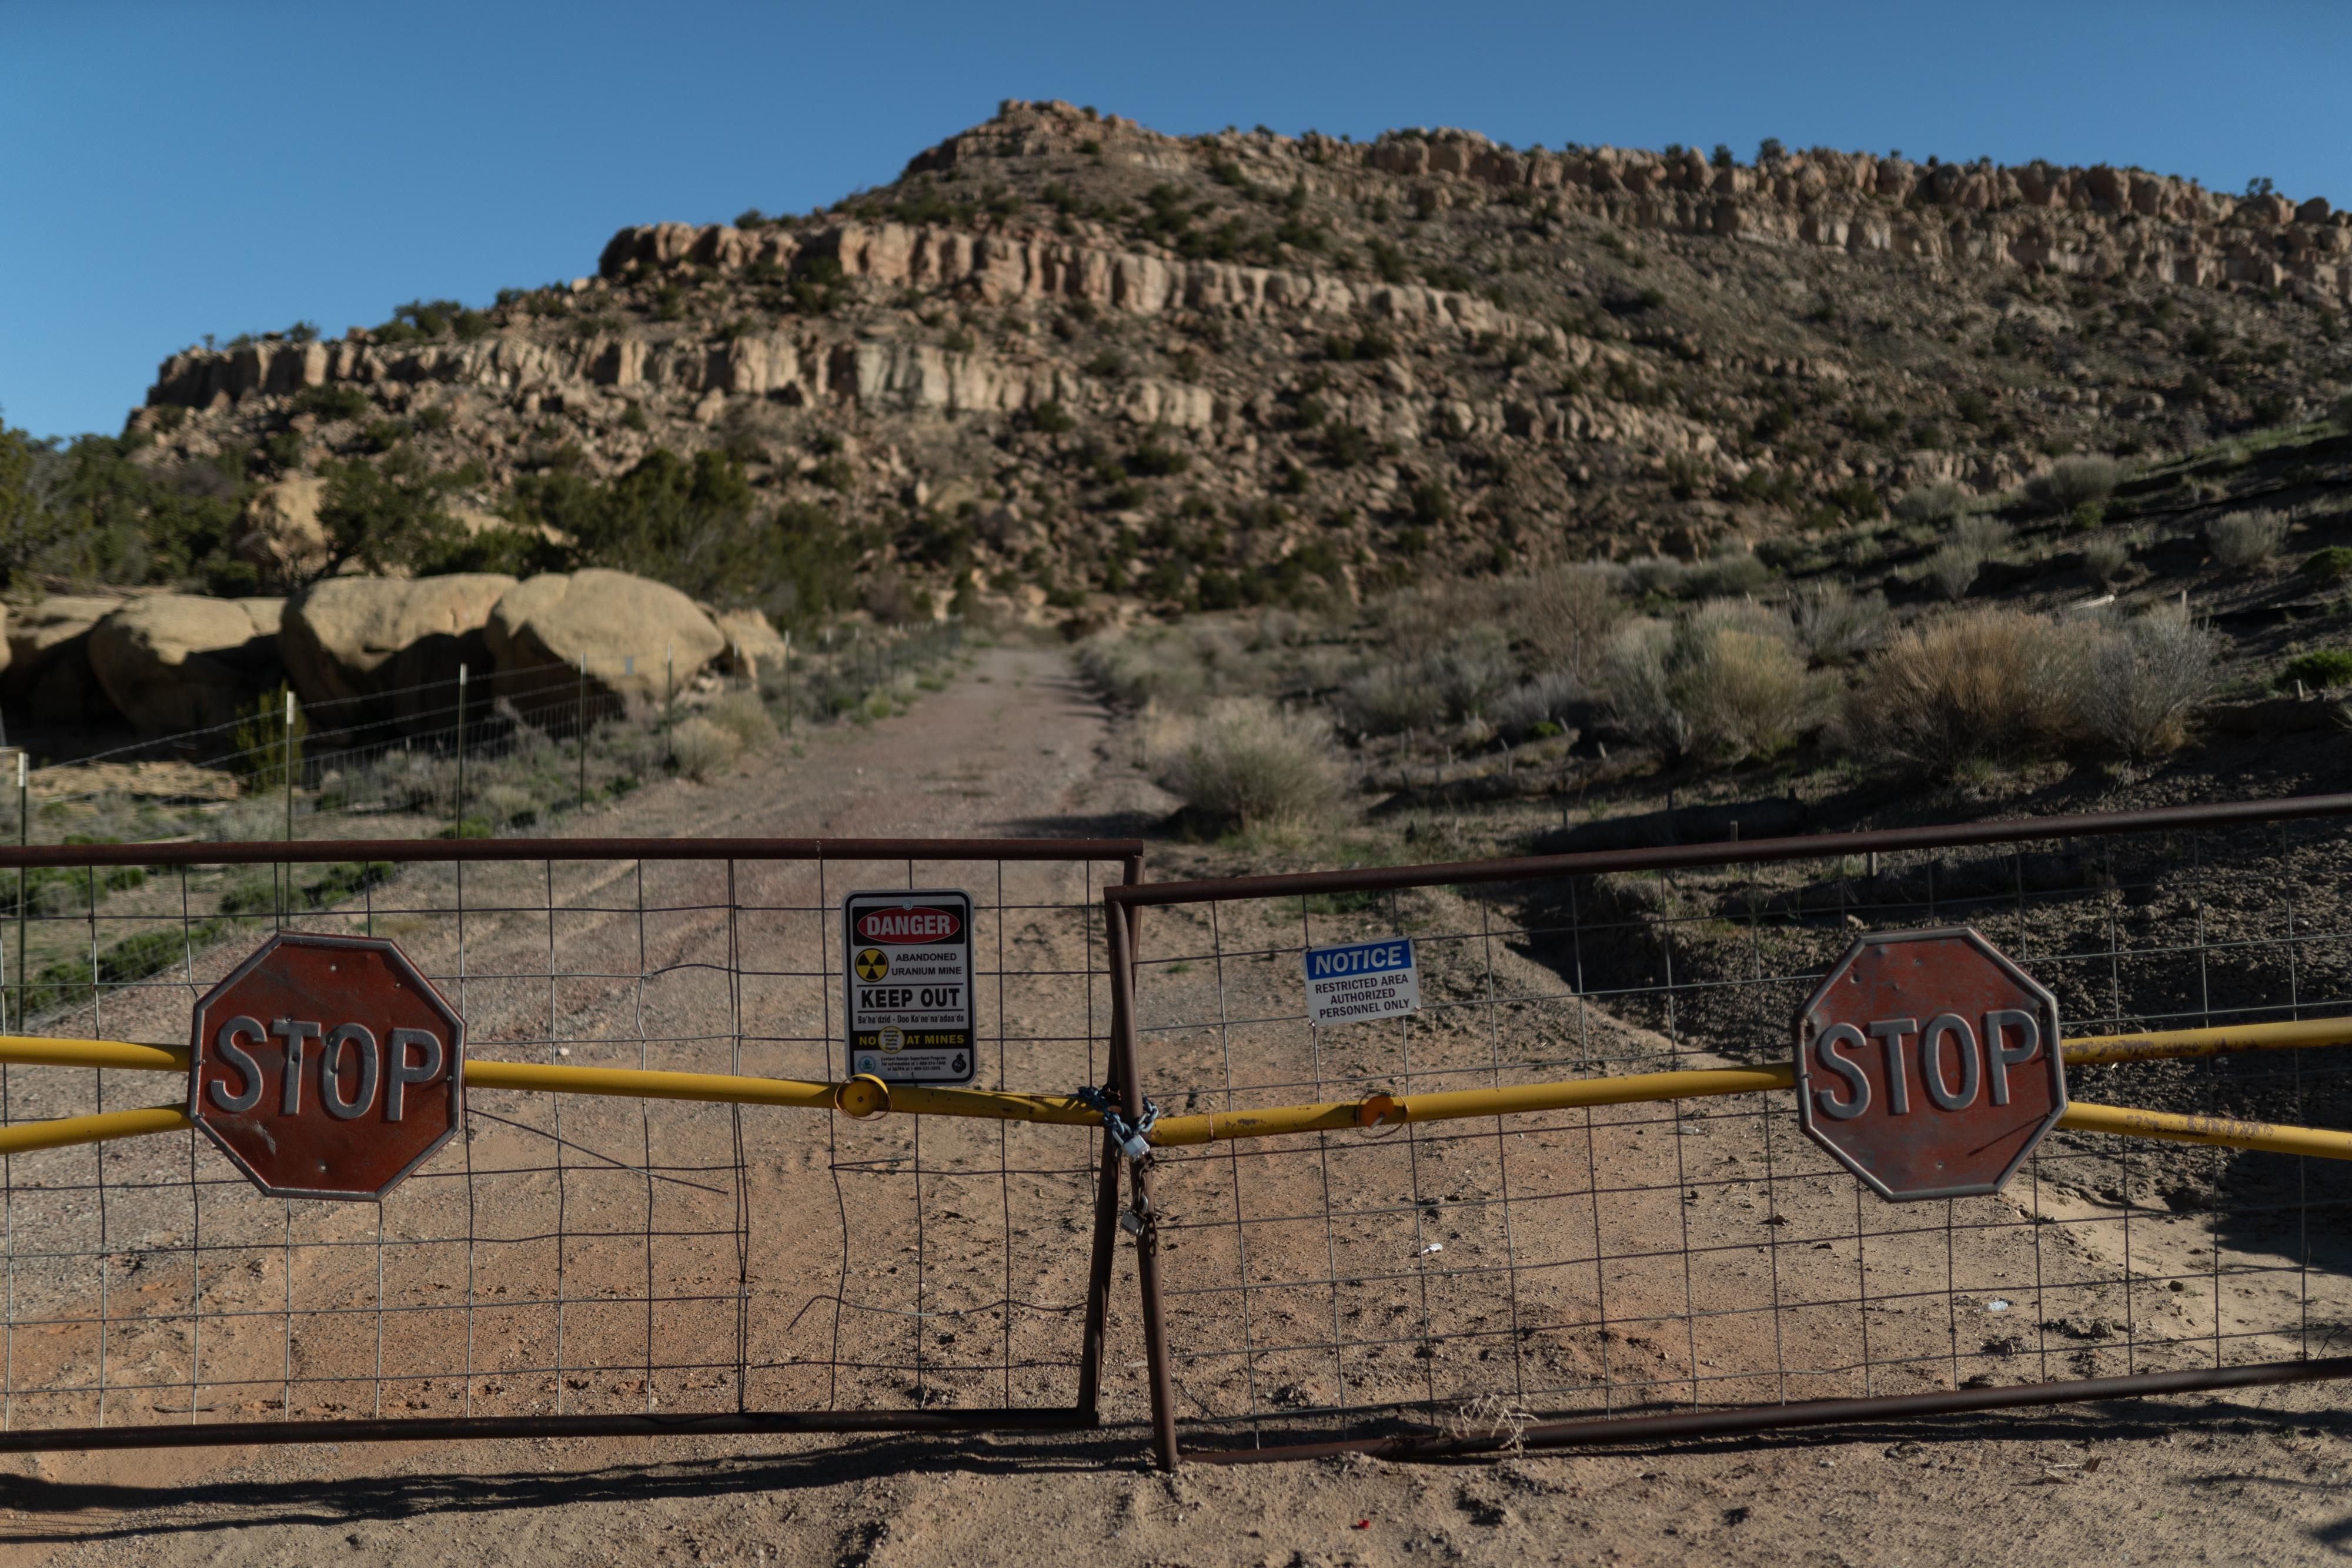 Church Rock, America's Forgotten Nuclear Disaster, Is Still